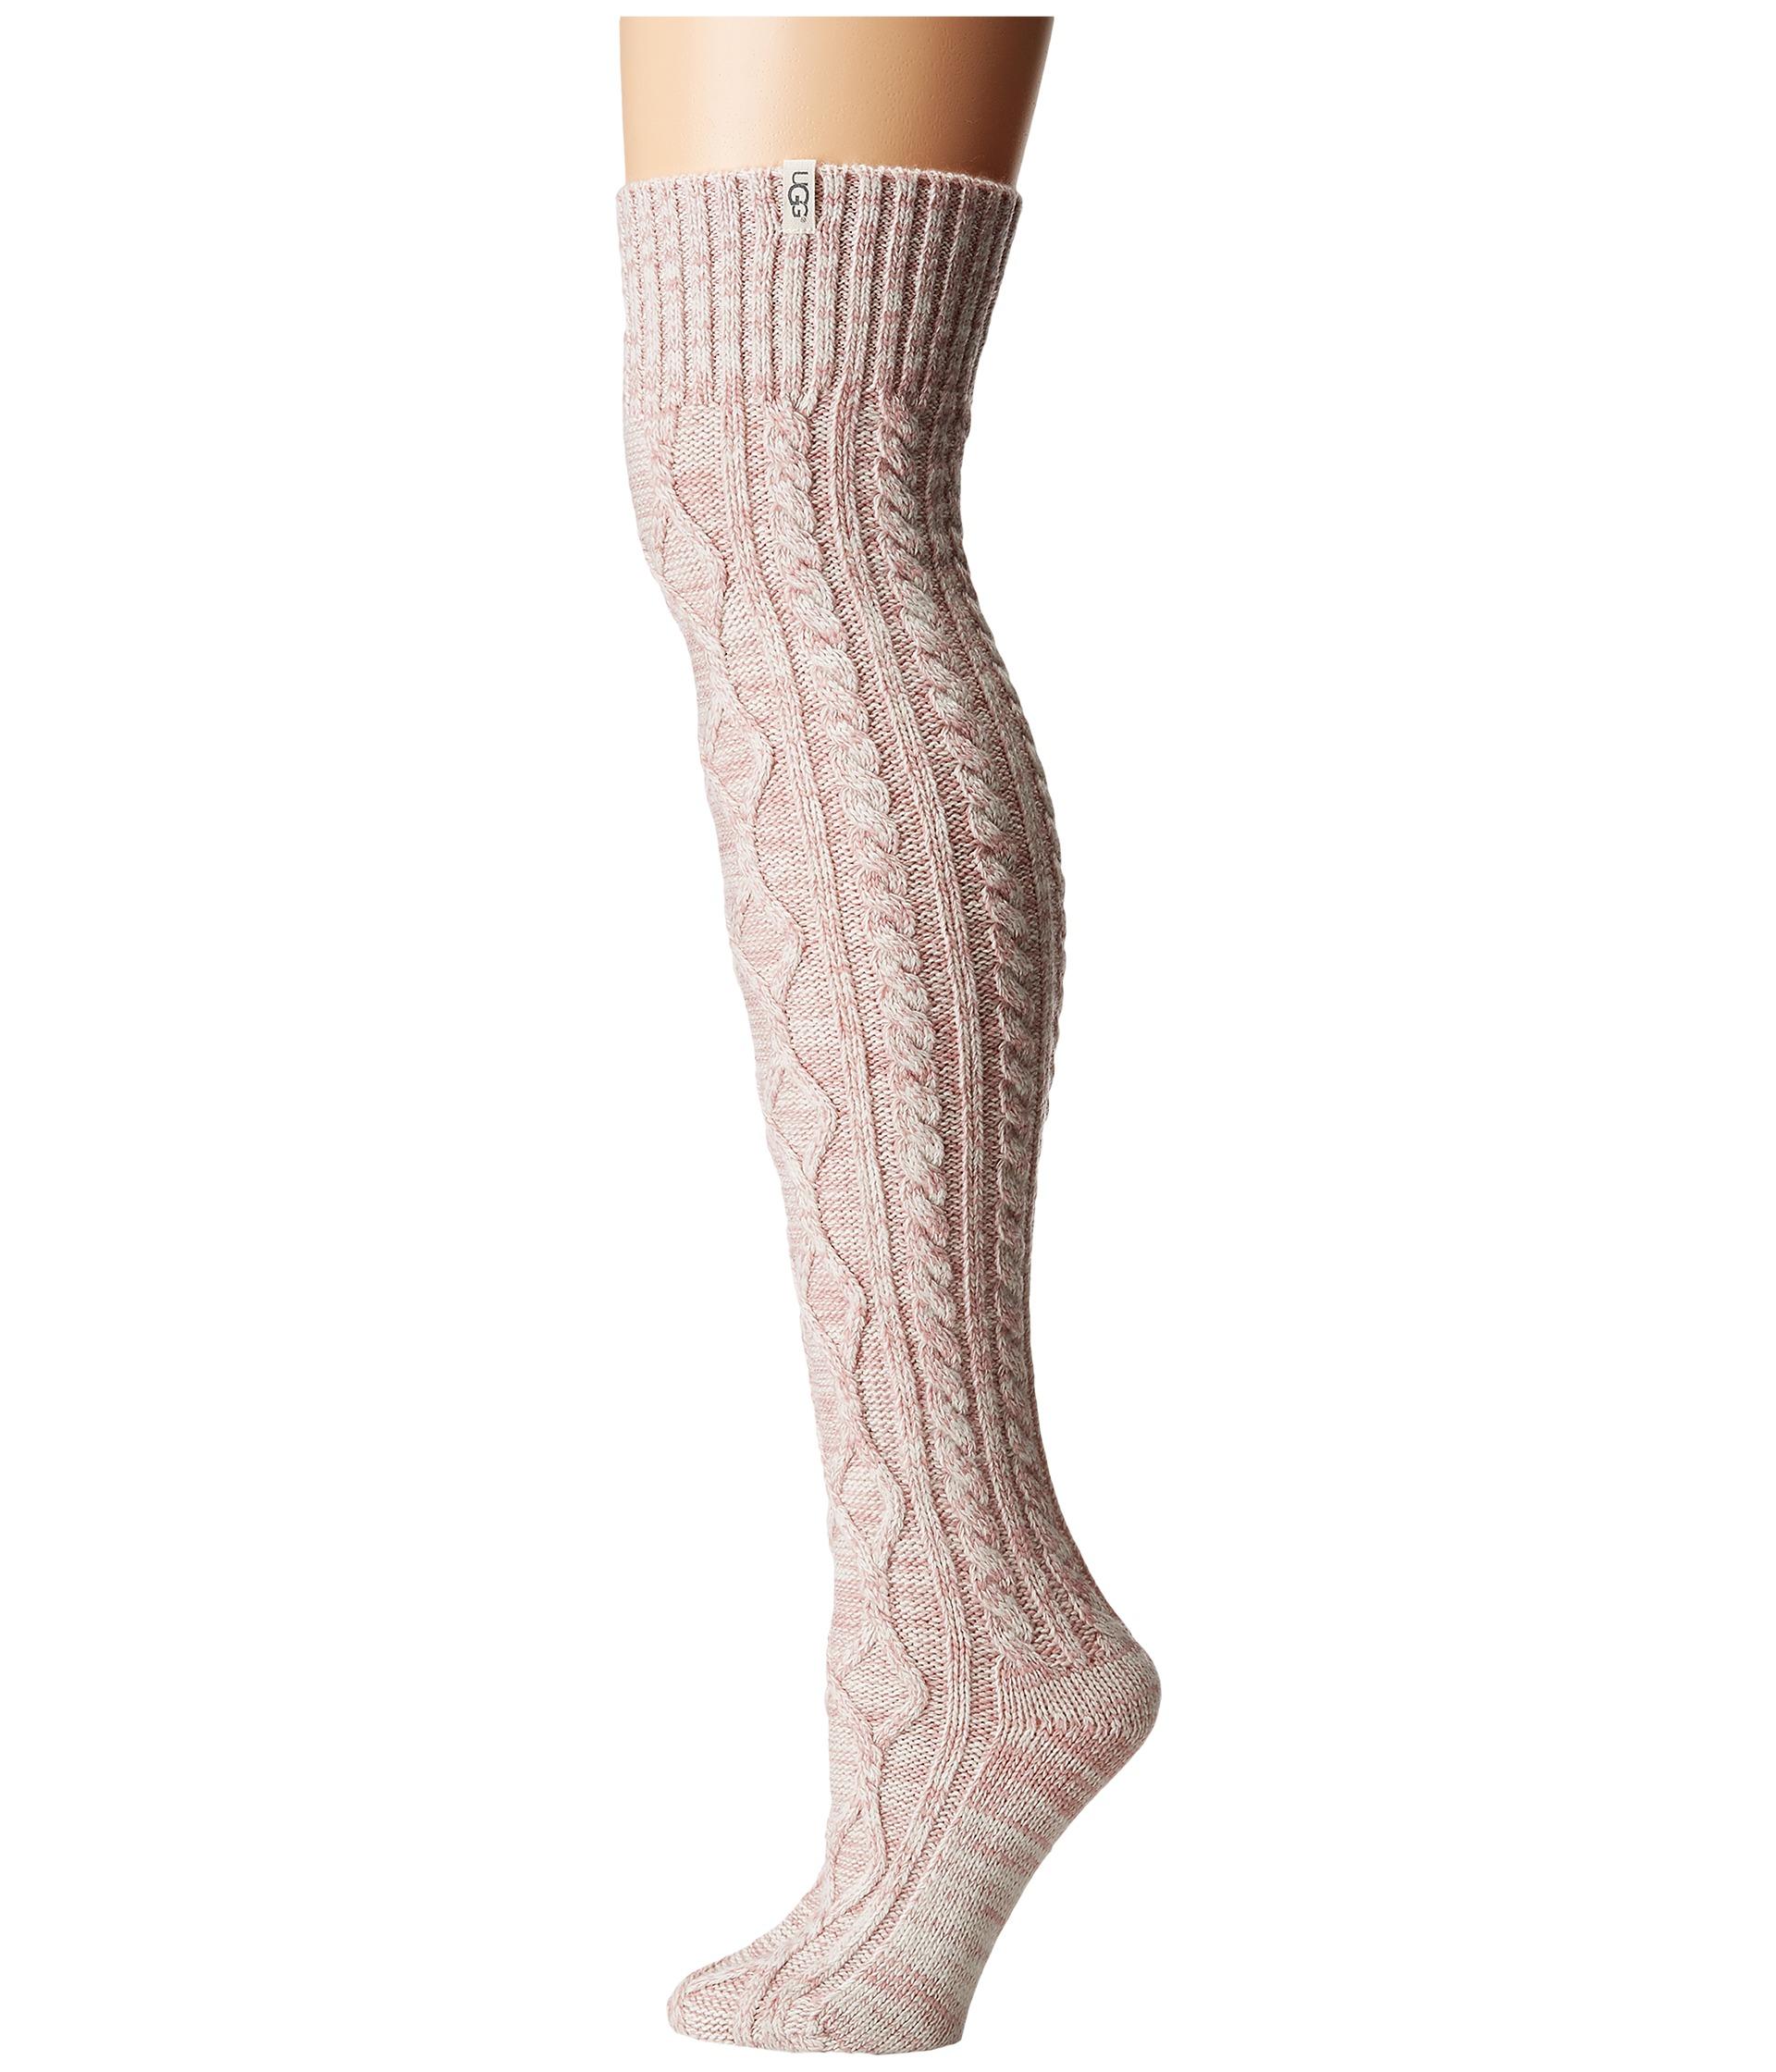 Ugg Cable Knit Socks At Zappos Com